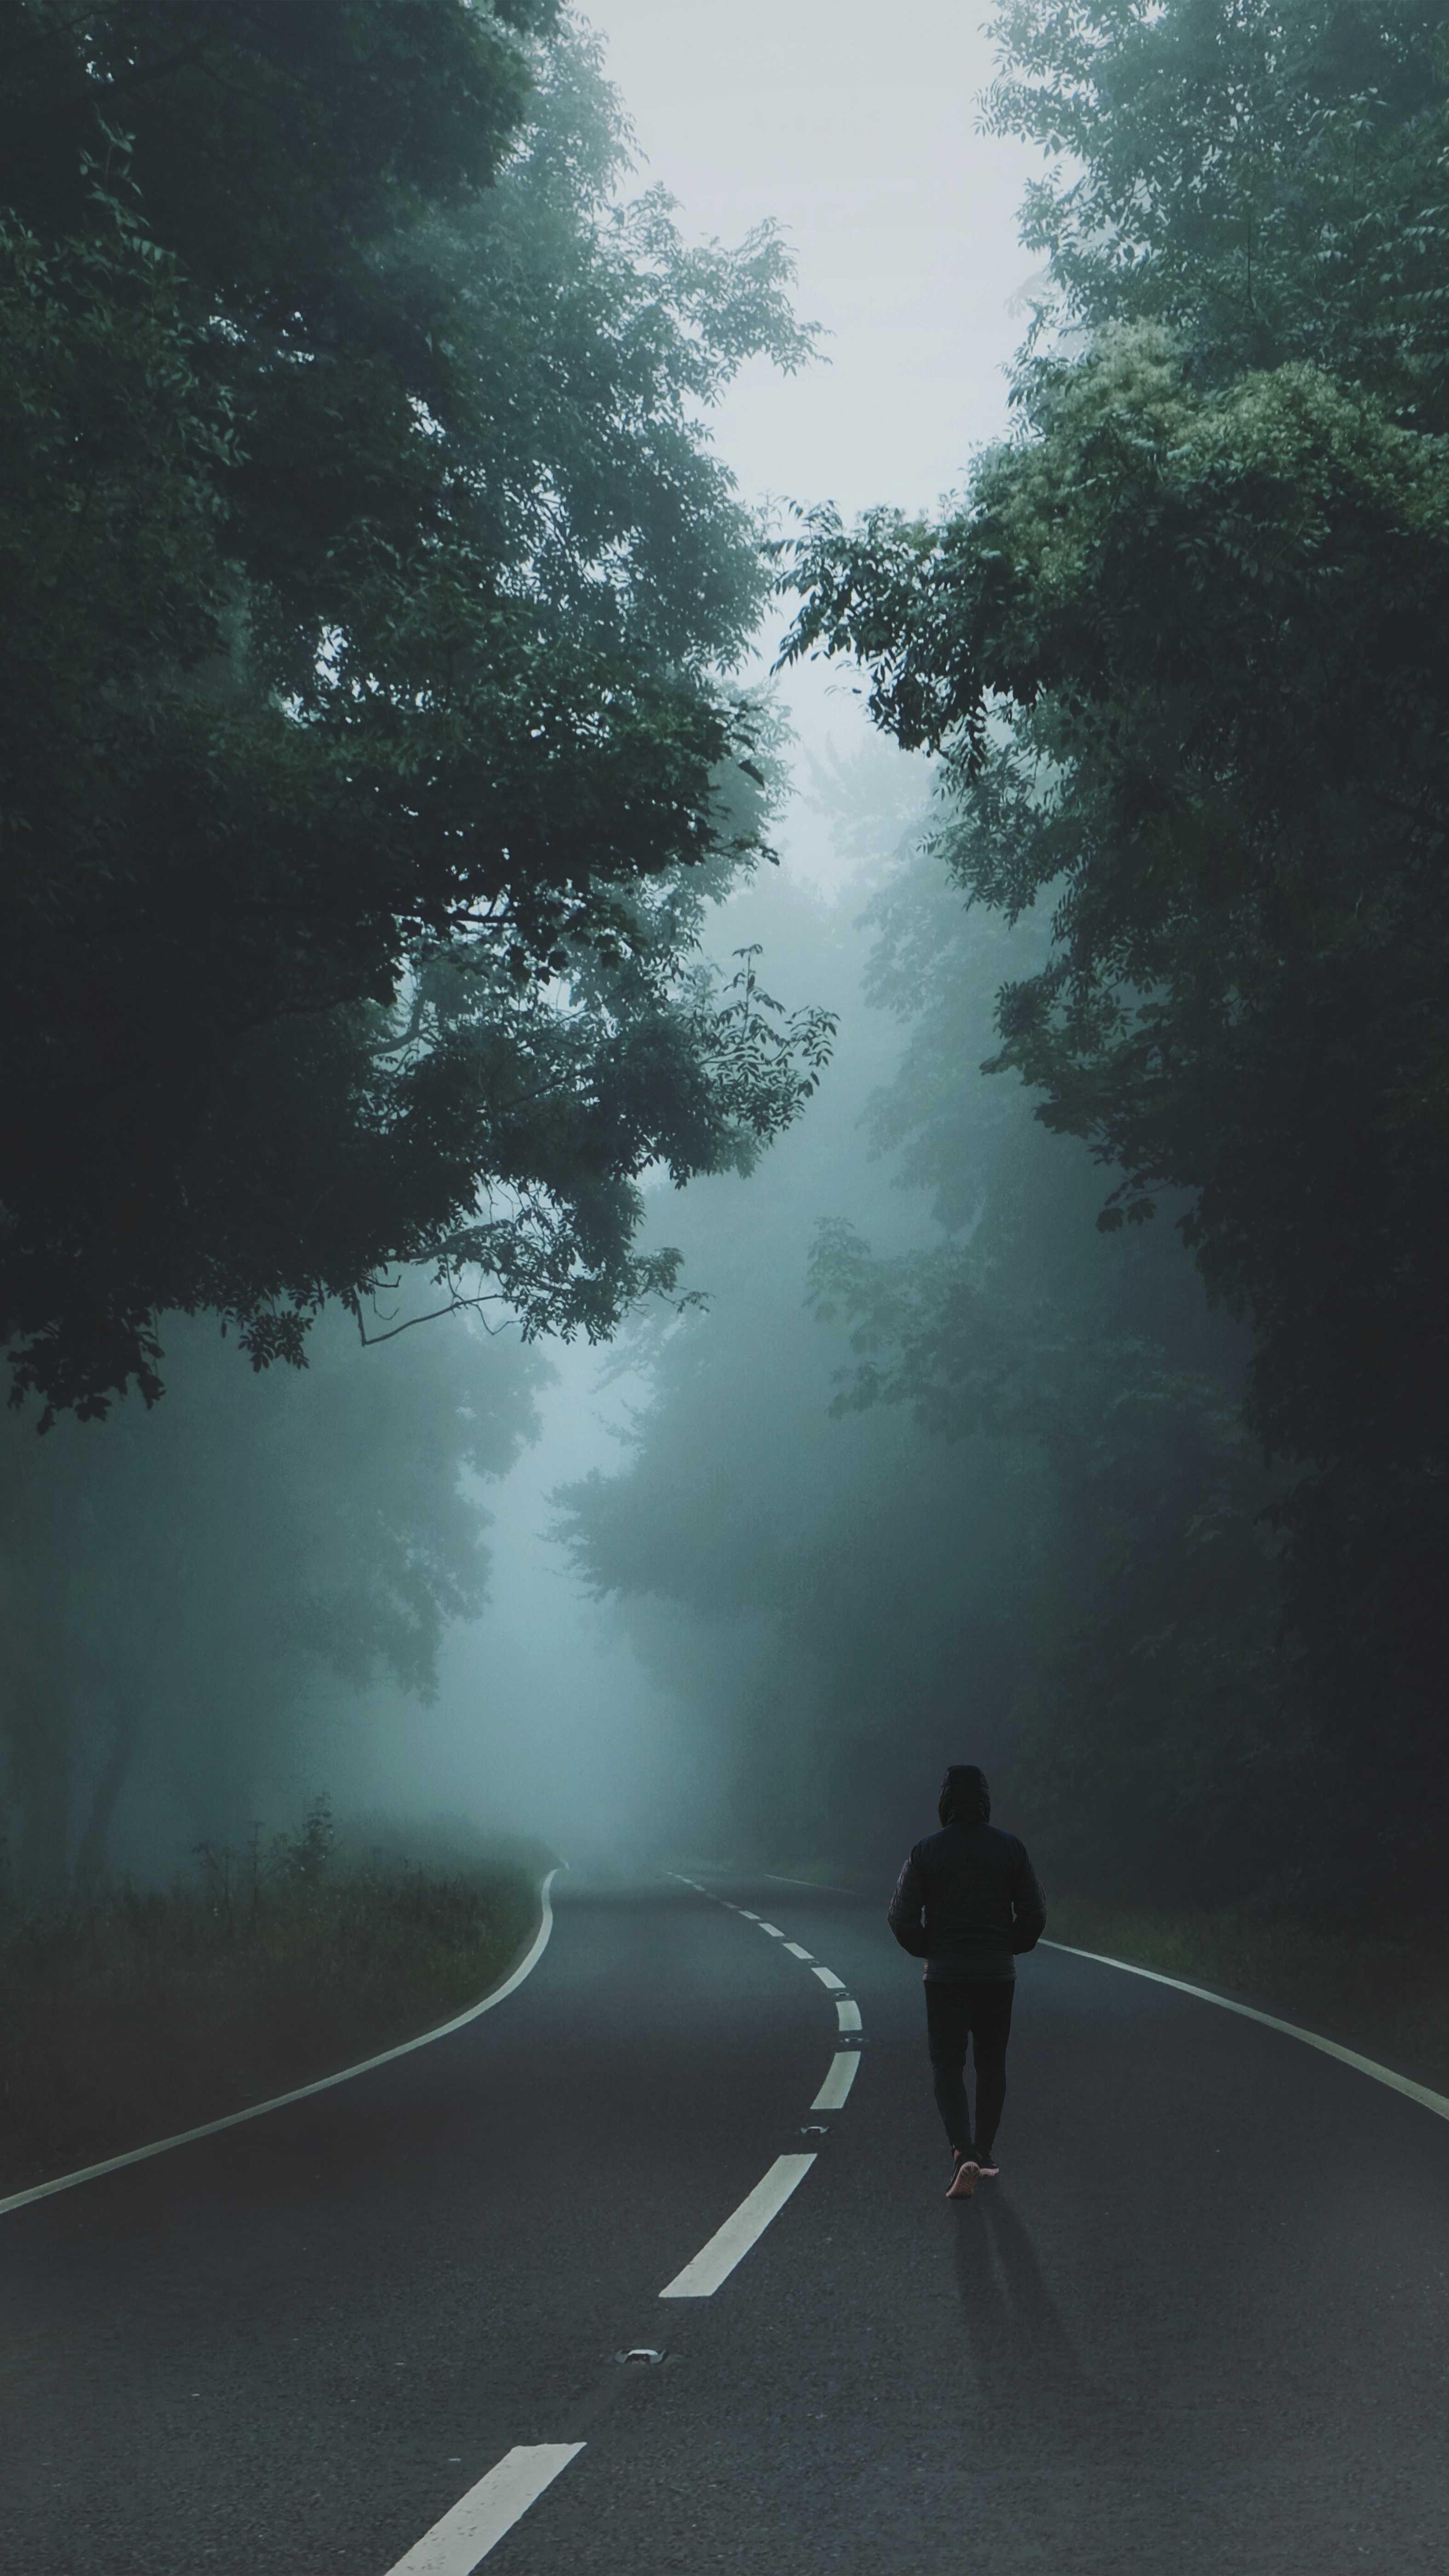 Man on Road Mist Nature iPhone Wallpaper